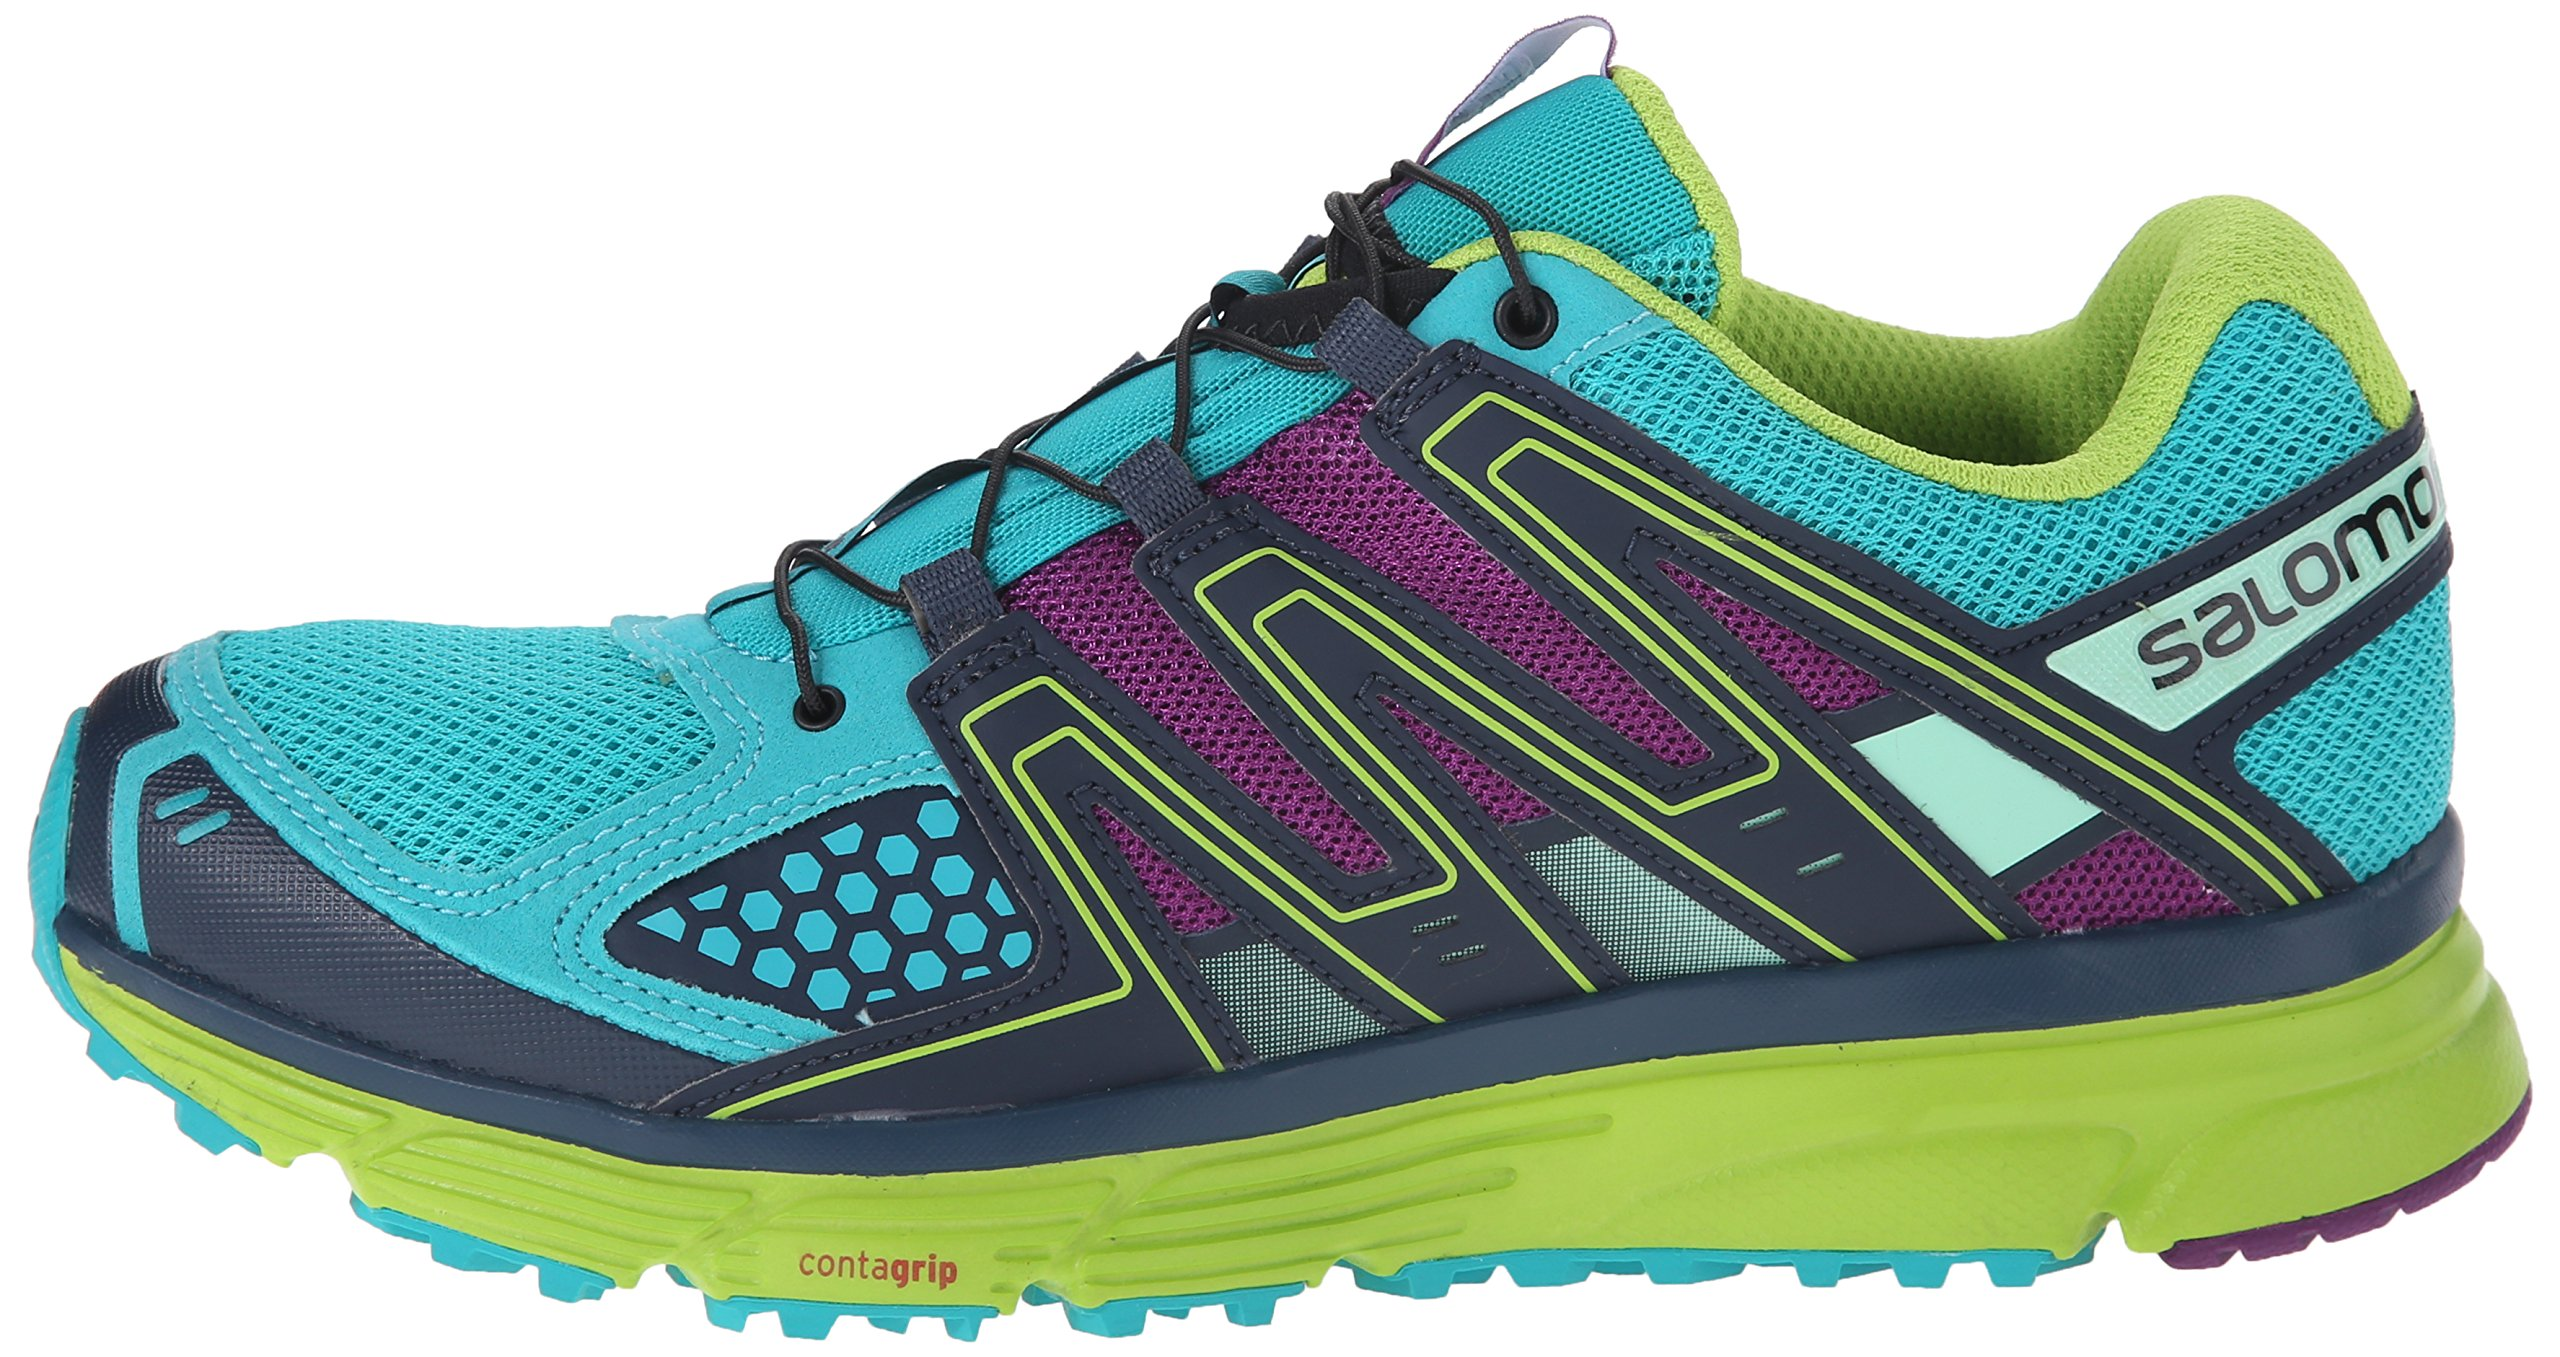 Salomon Women's X-Mission 3 W Trail Running Shoe, Teal Blue/Granny Green/Passion Purple, 7.5 B US by Salomon (Image #5)